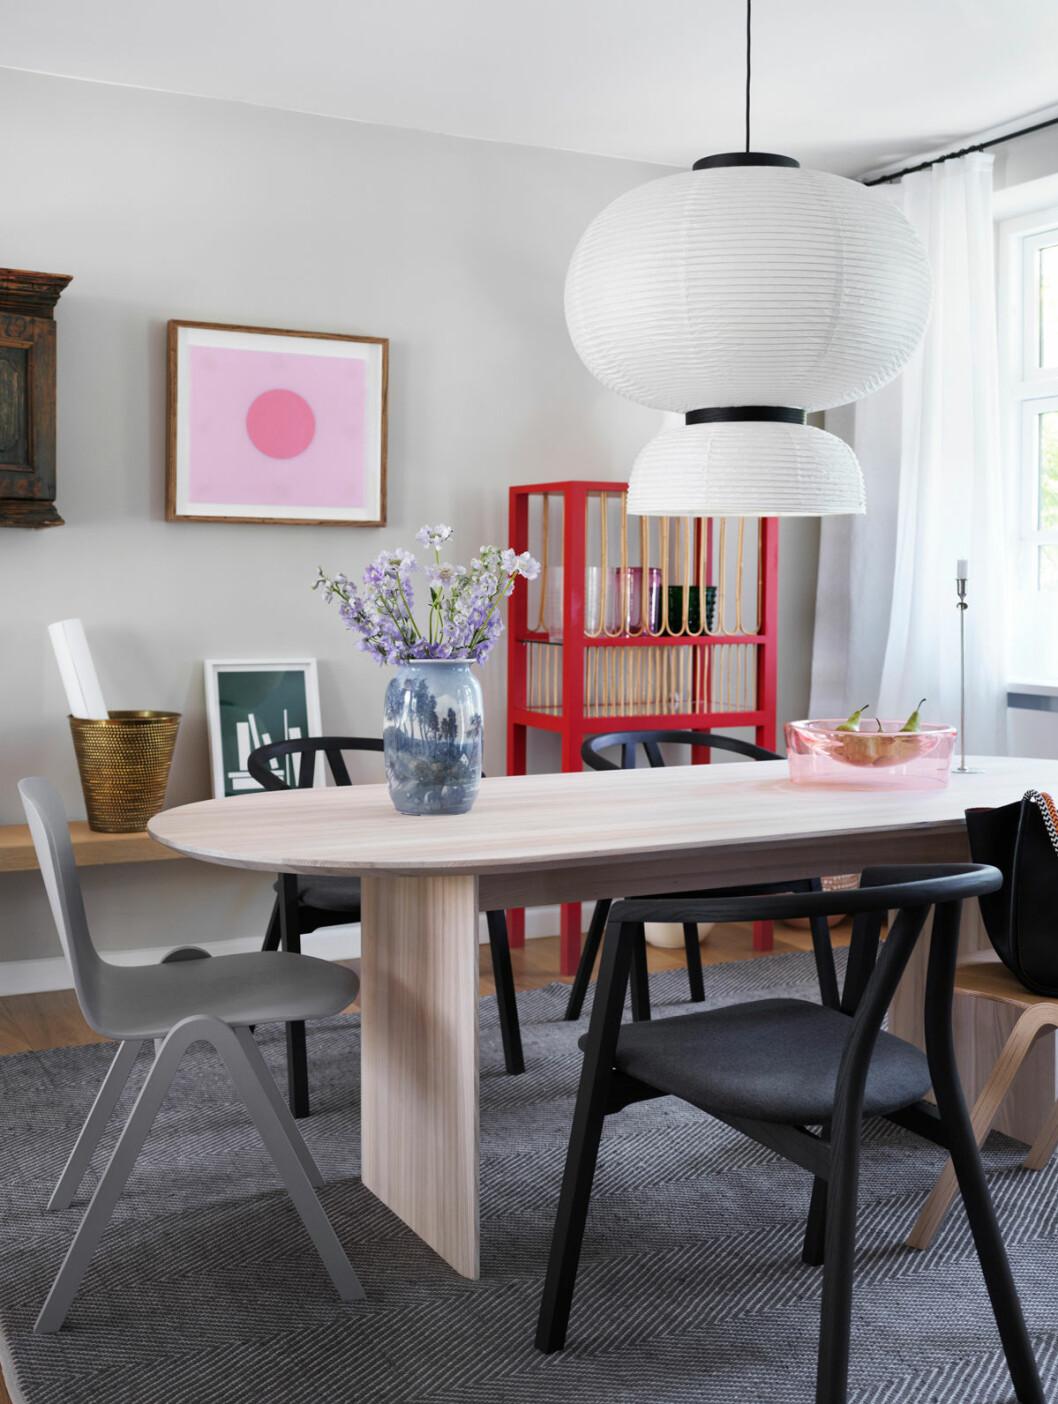 Hemma hos Mia Lagerman Köpenhamn matbord lampa